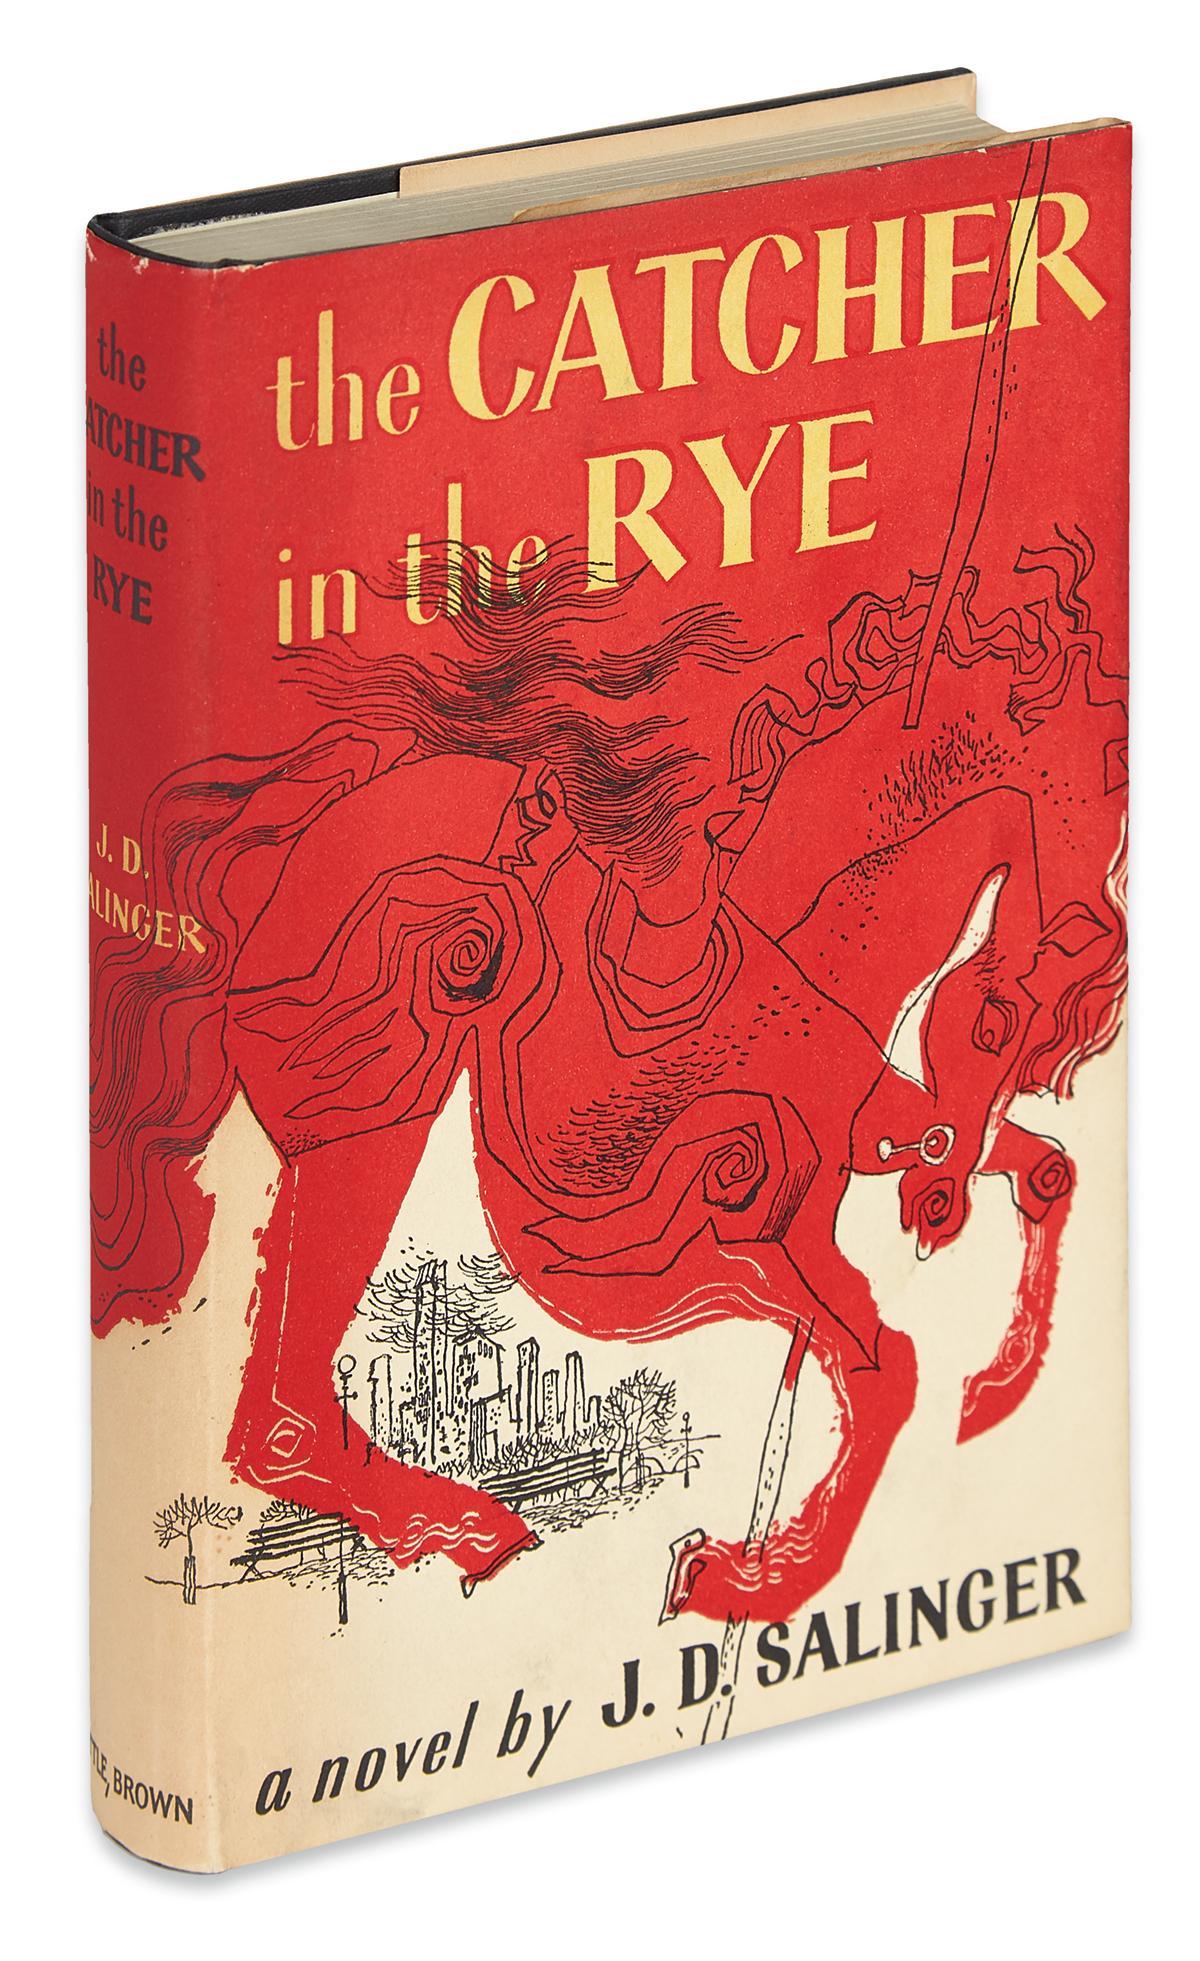 SALINGER, J.D. The Catcher in the Rye.